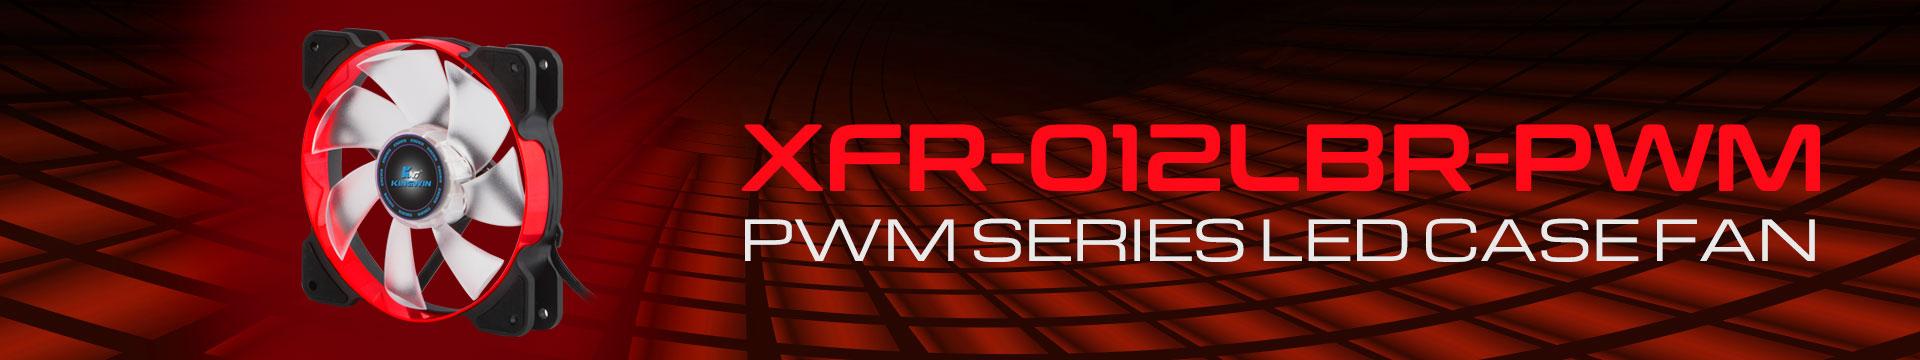 XFBR-012LBR-PWM_WEB_BANNER2